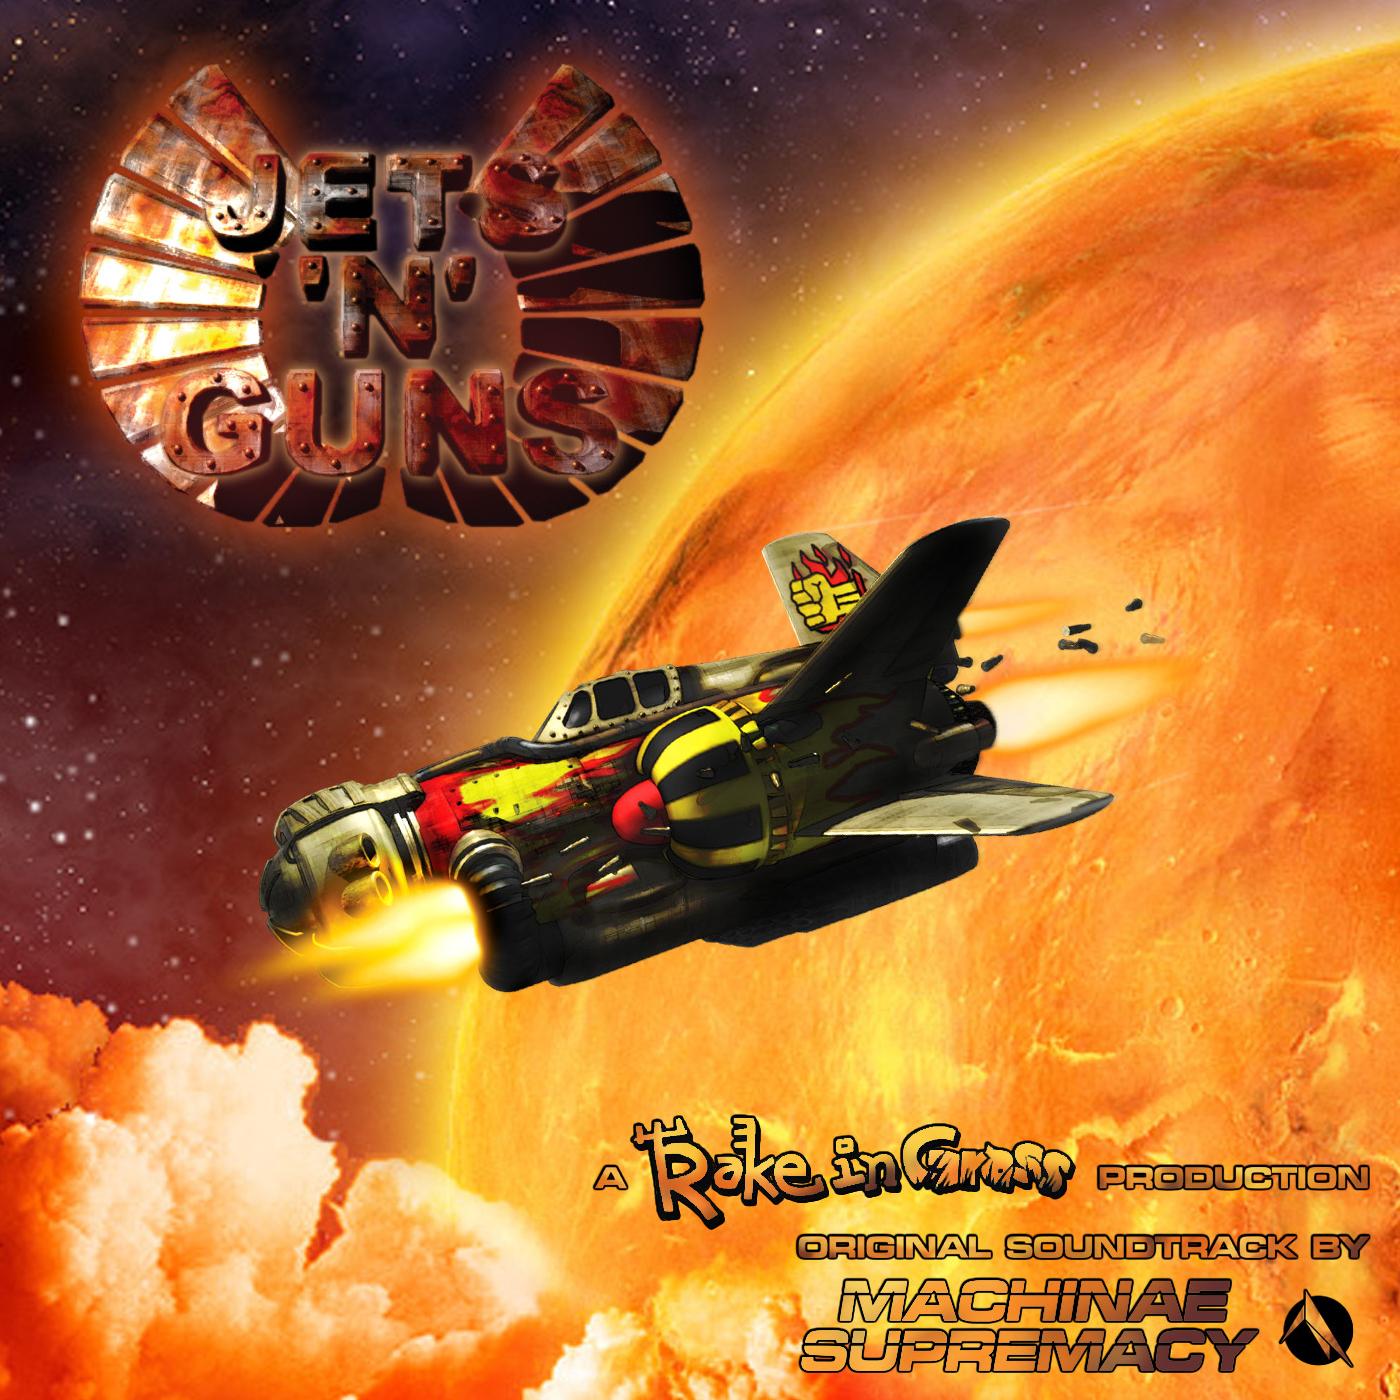 Jets'n'Guns Soundtrack